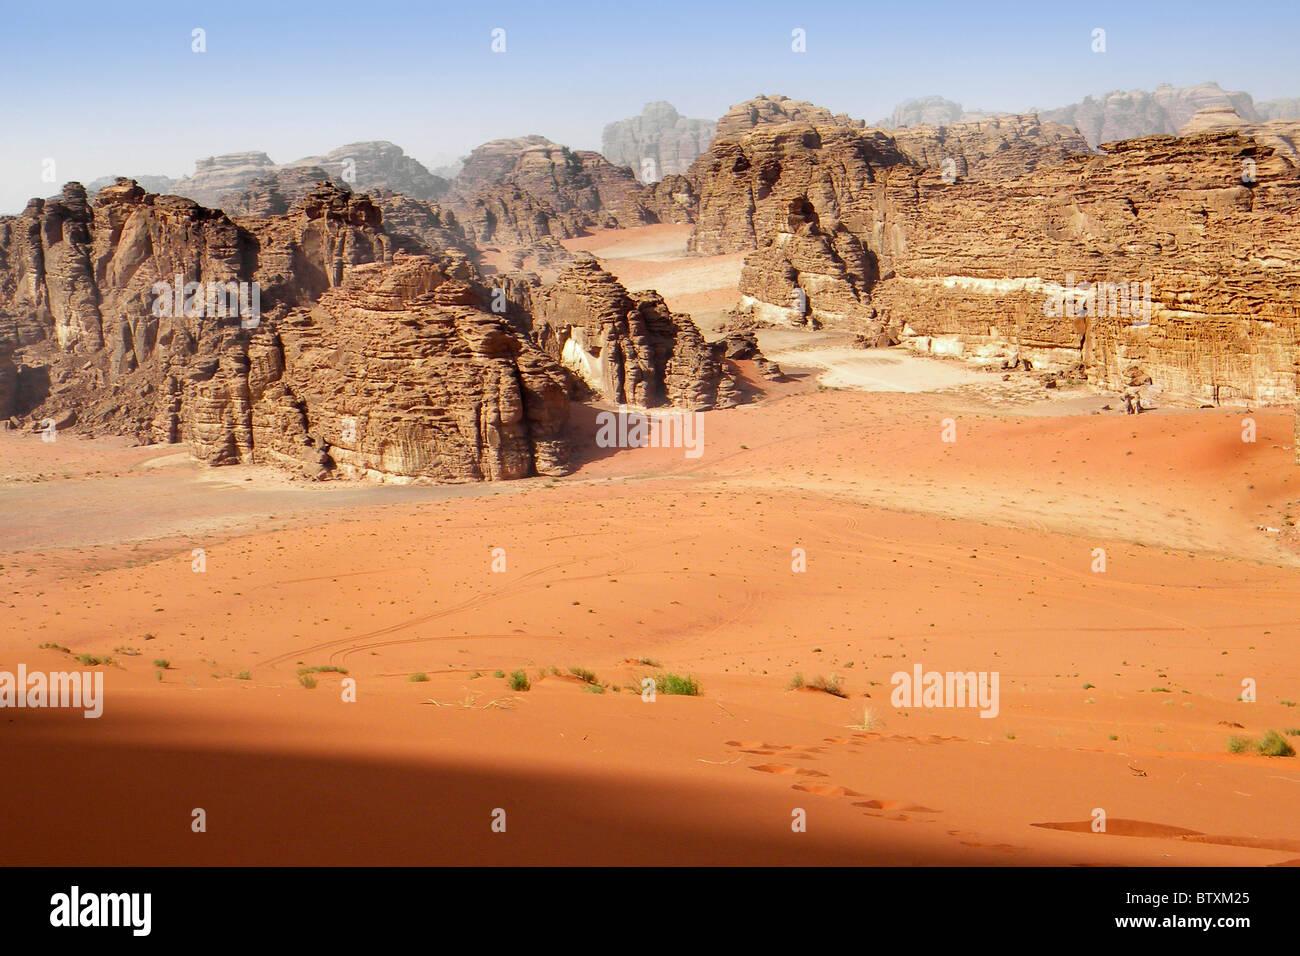 Al Ula mountain, Saudi Arabia - Stock Image